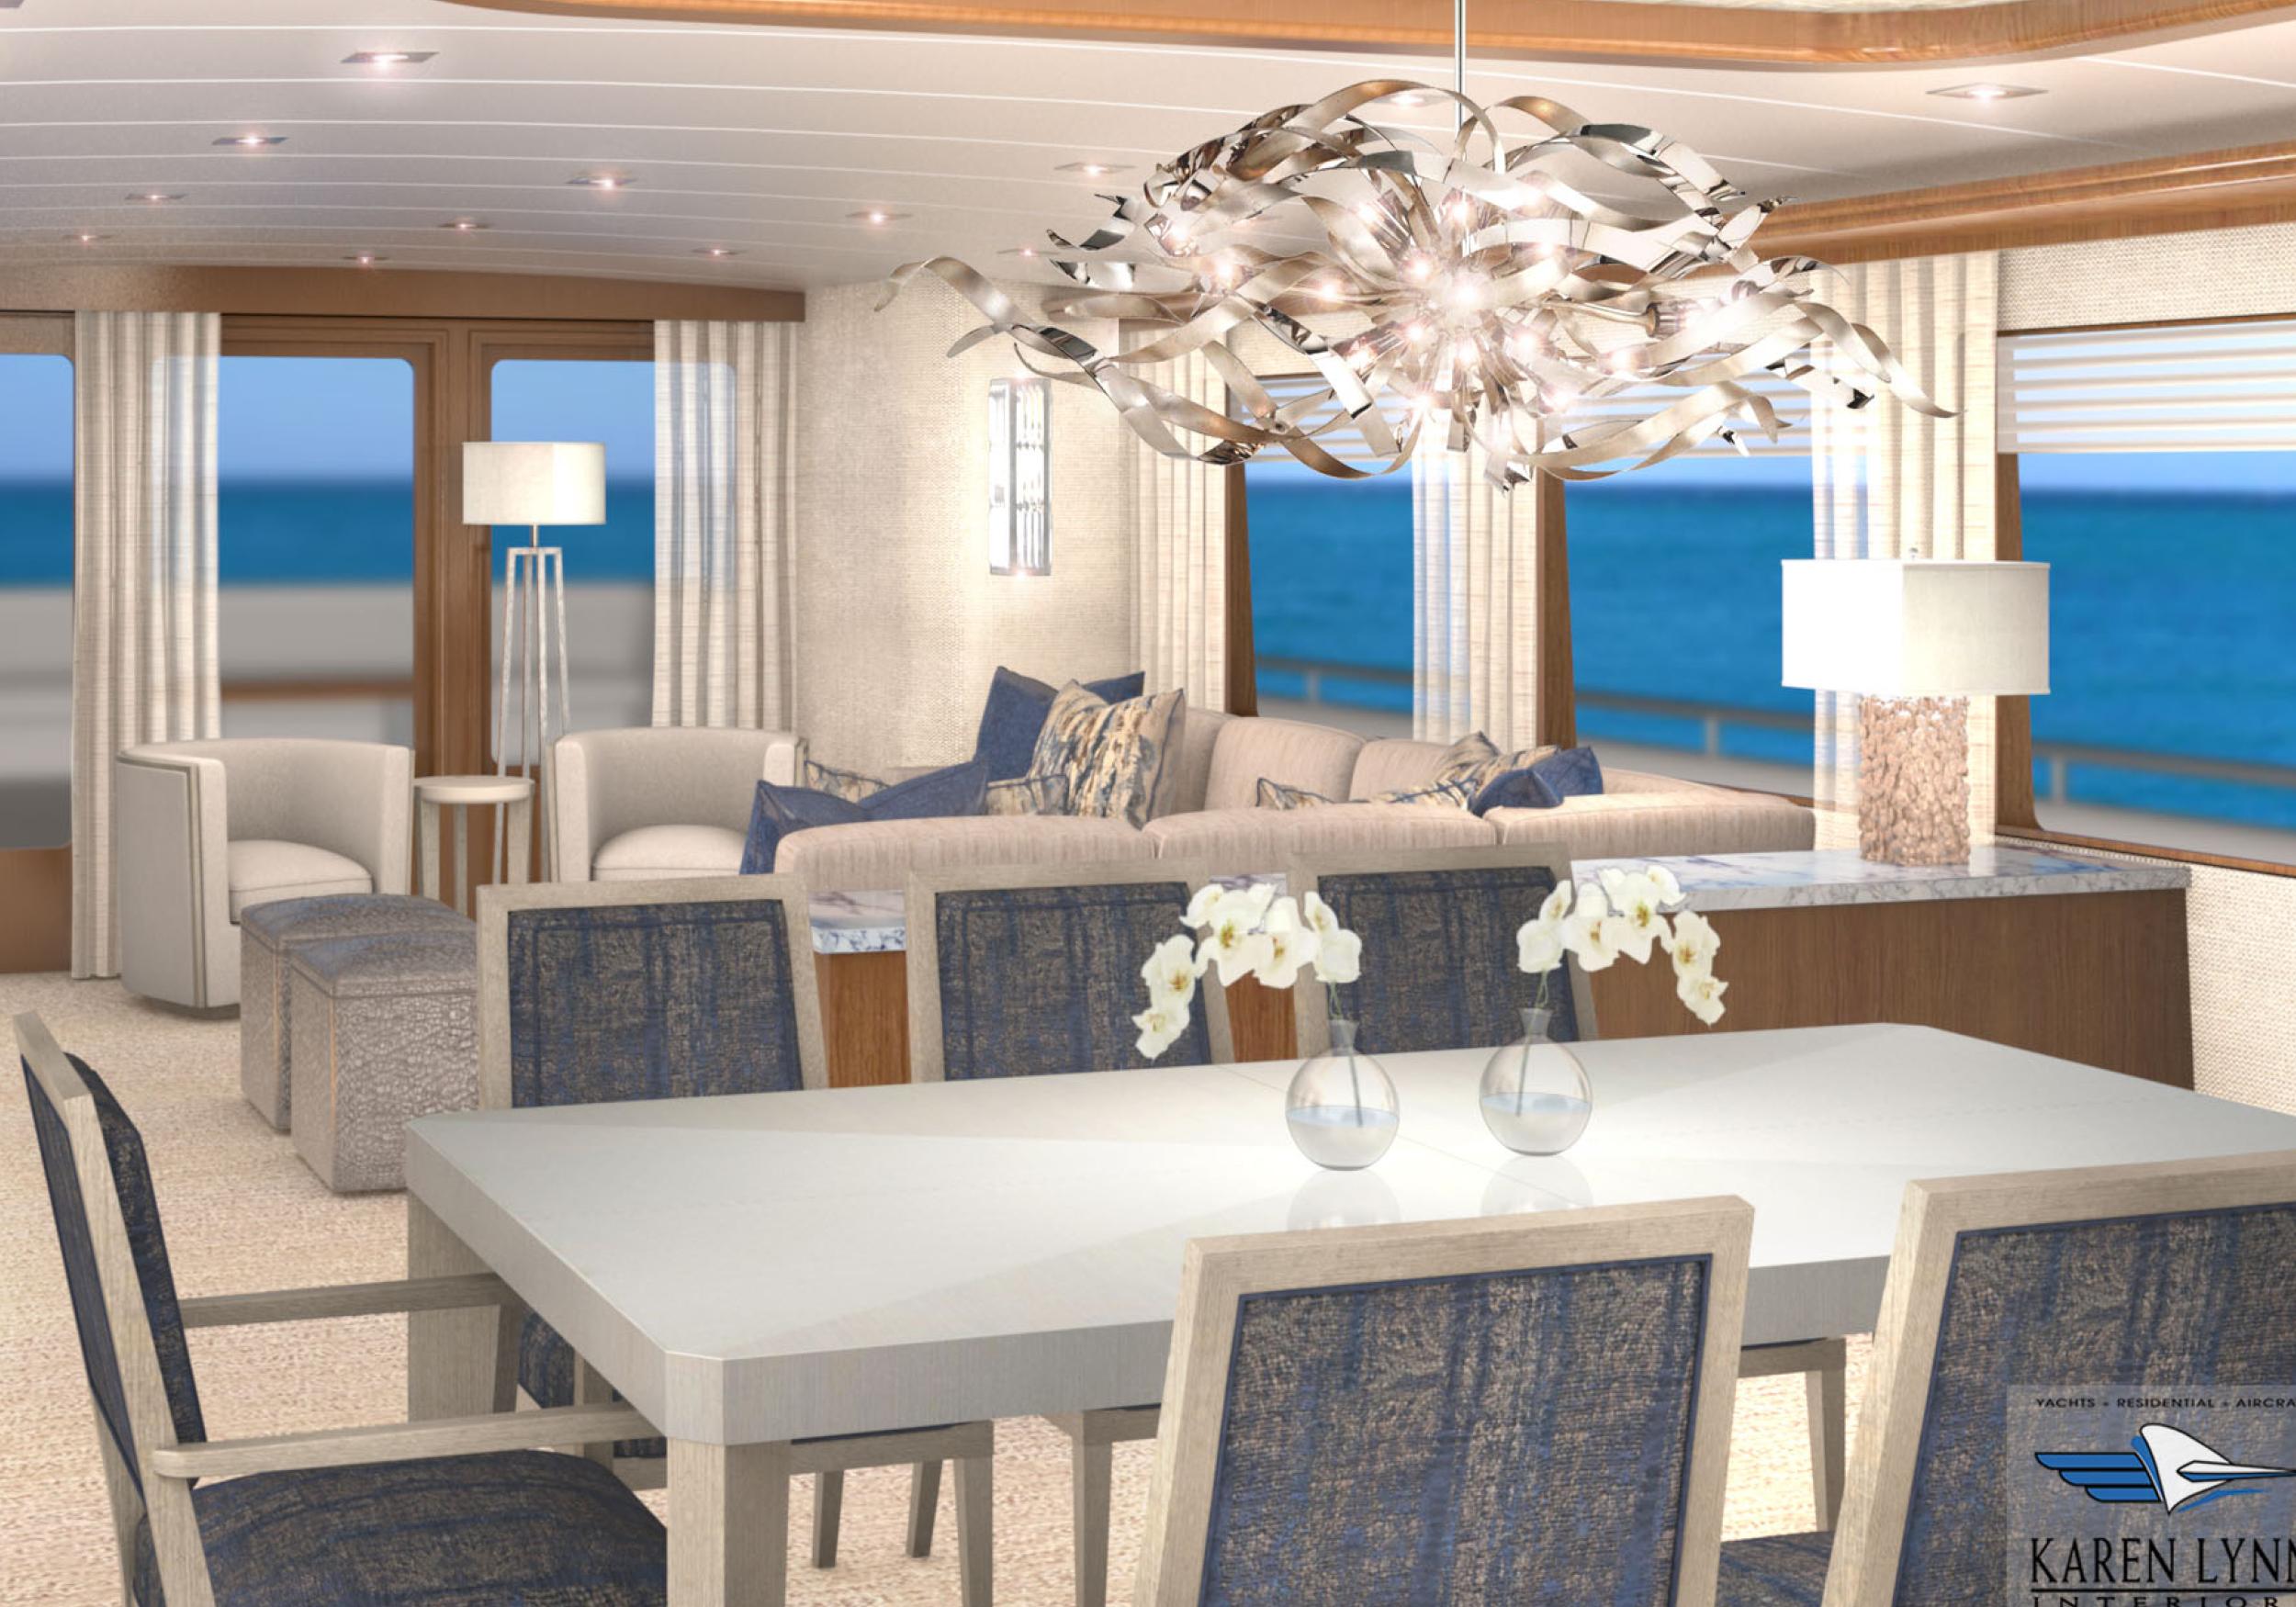 Karen-Lynn-Interior-Design-Yacht-Winning-Hand-11.jpg